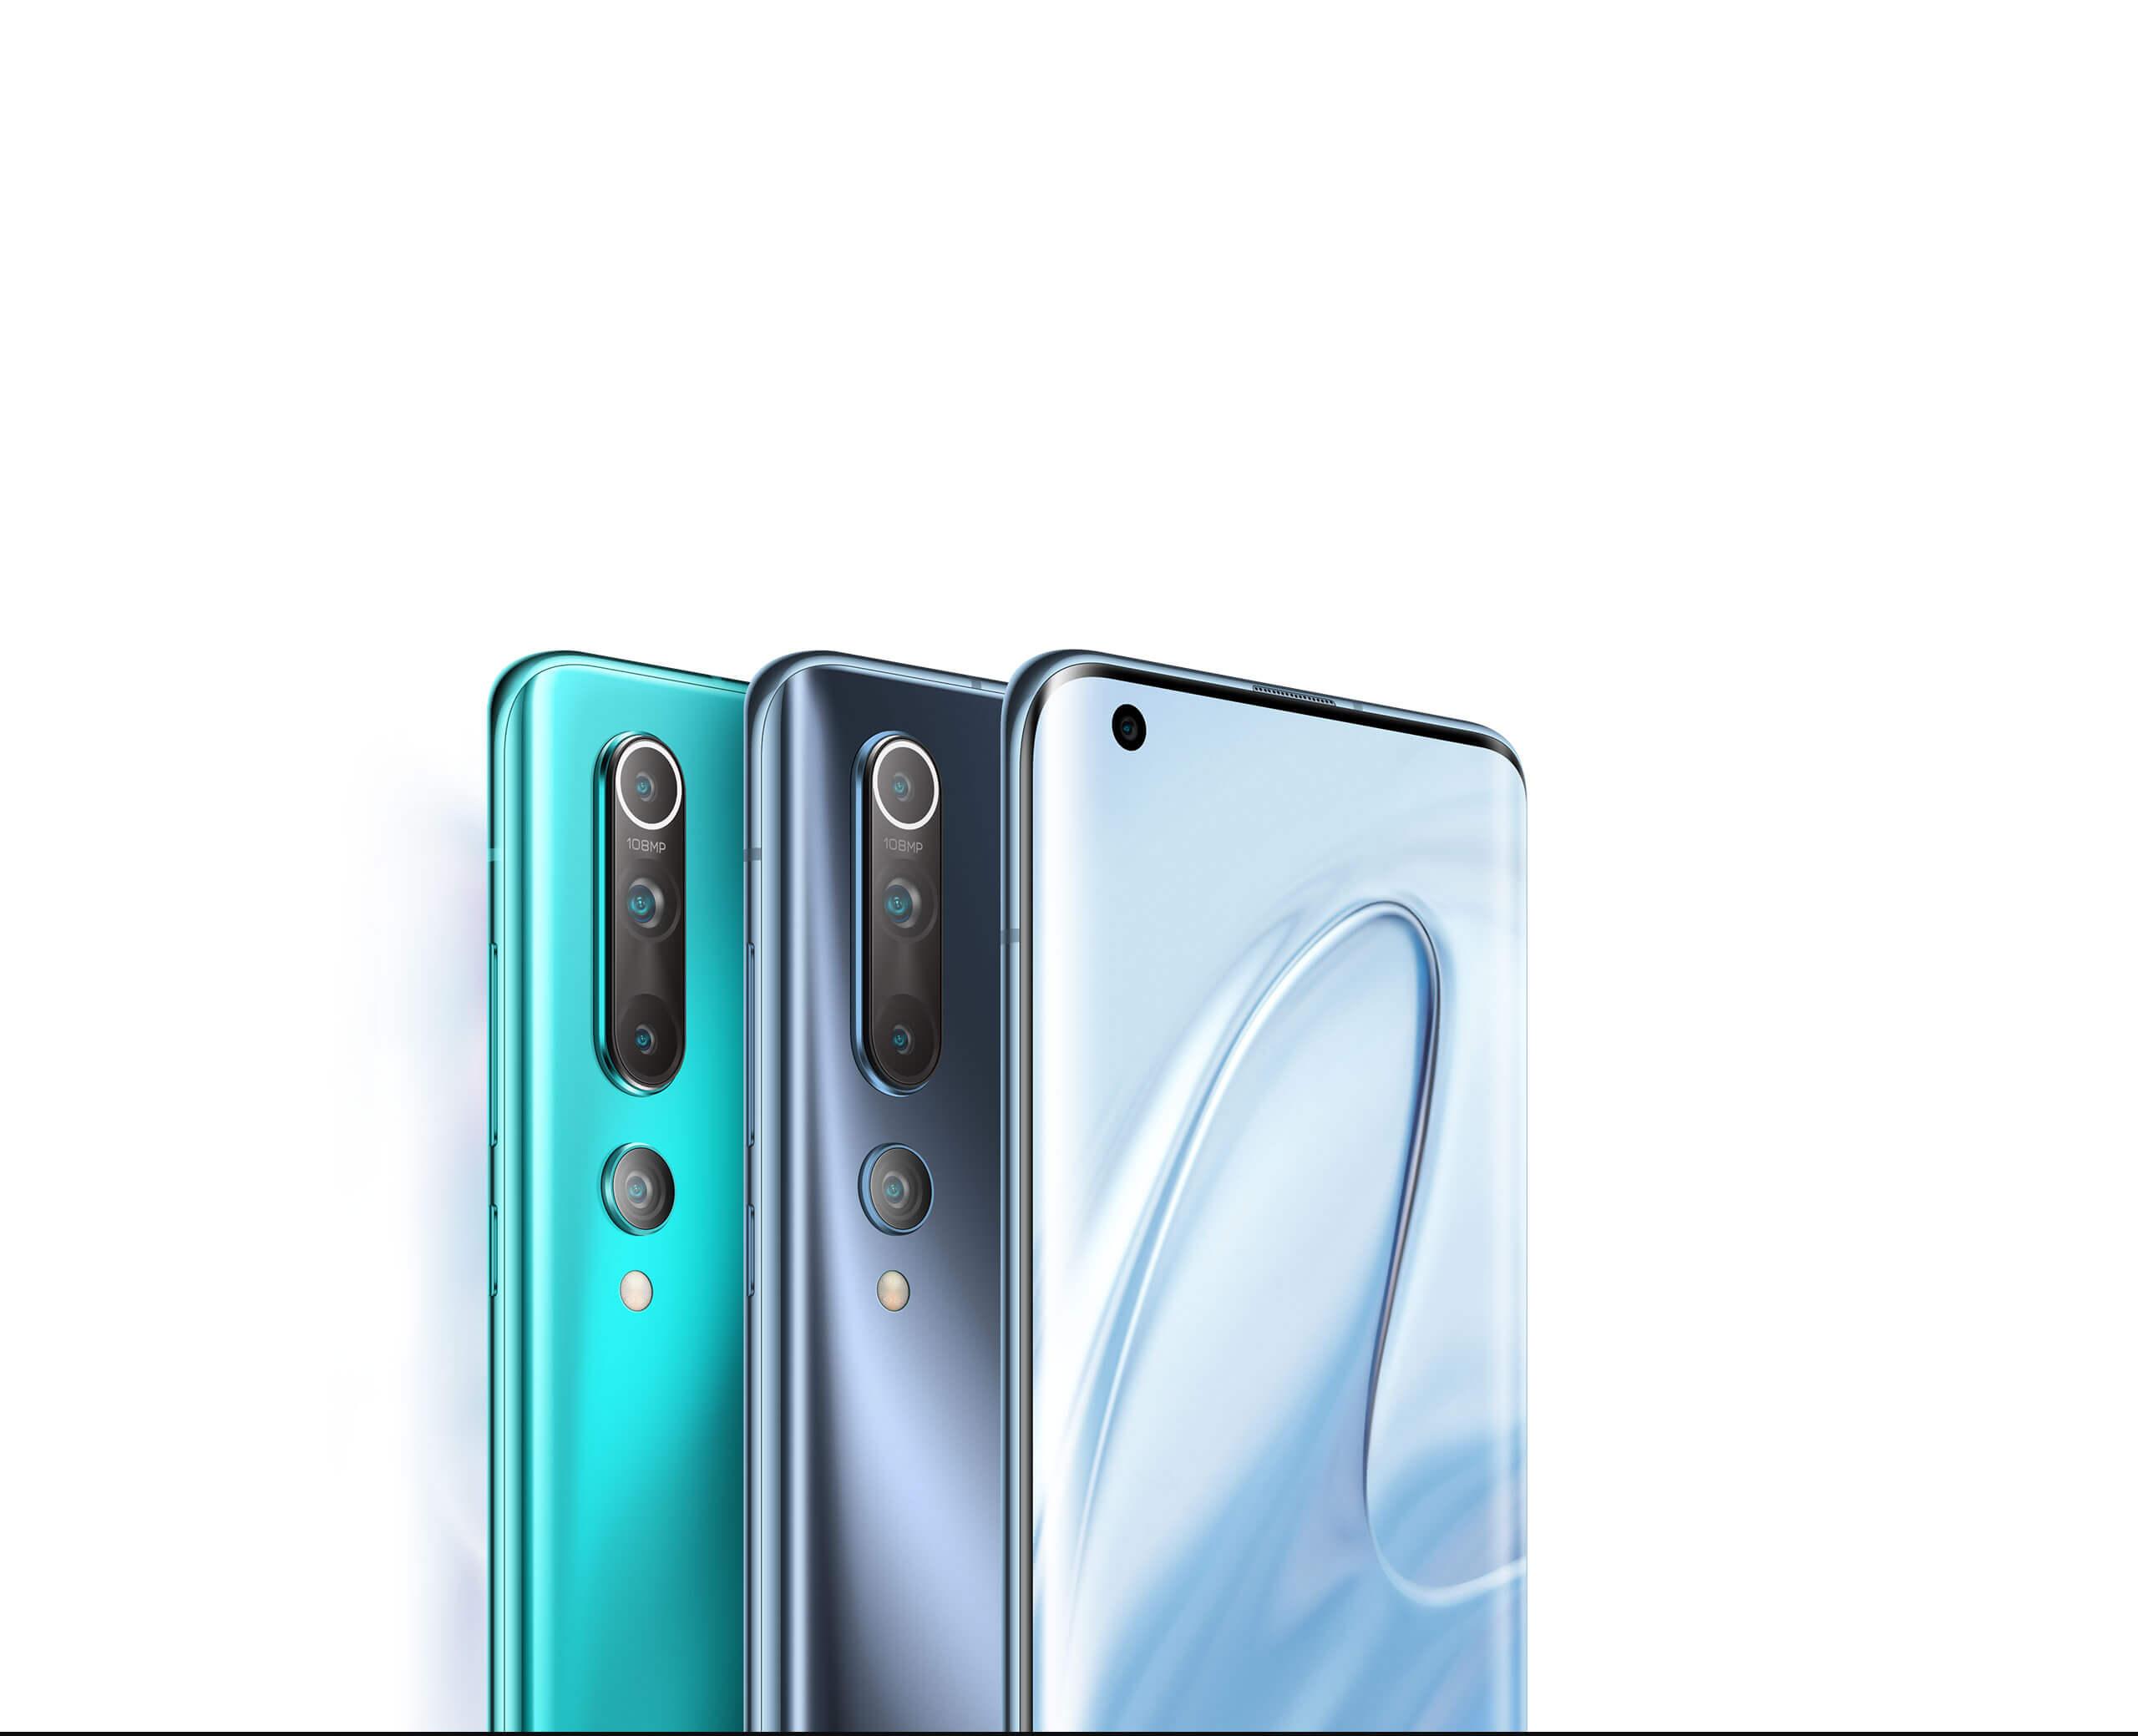 Xiaomi Mi 10 Specifications,